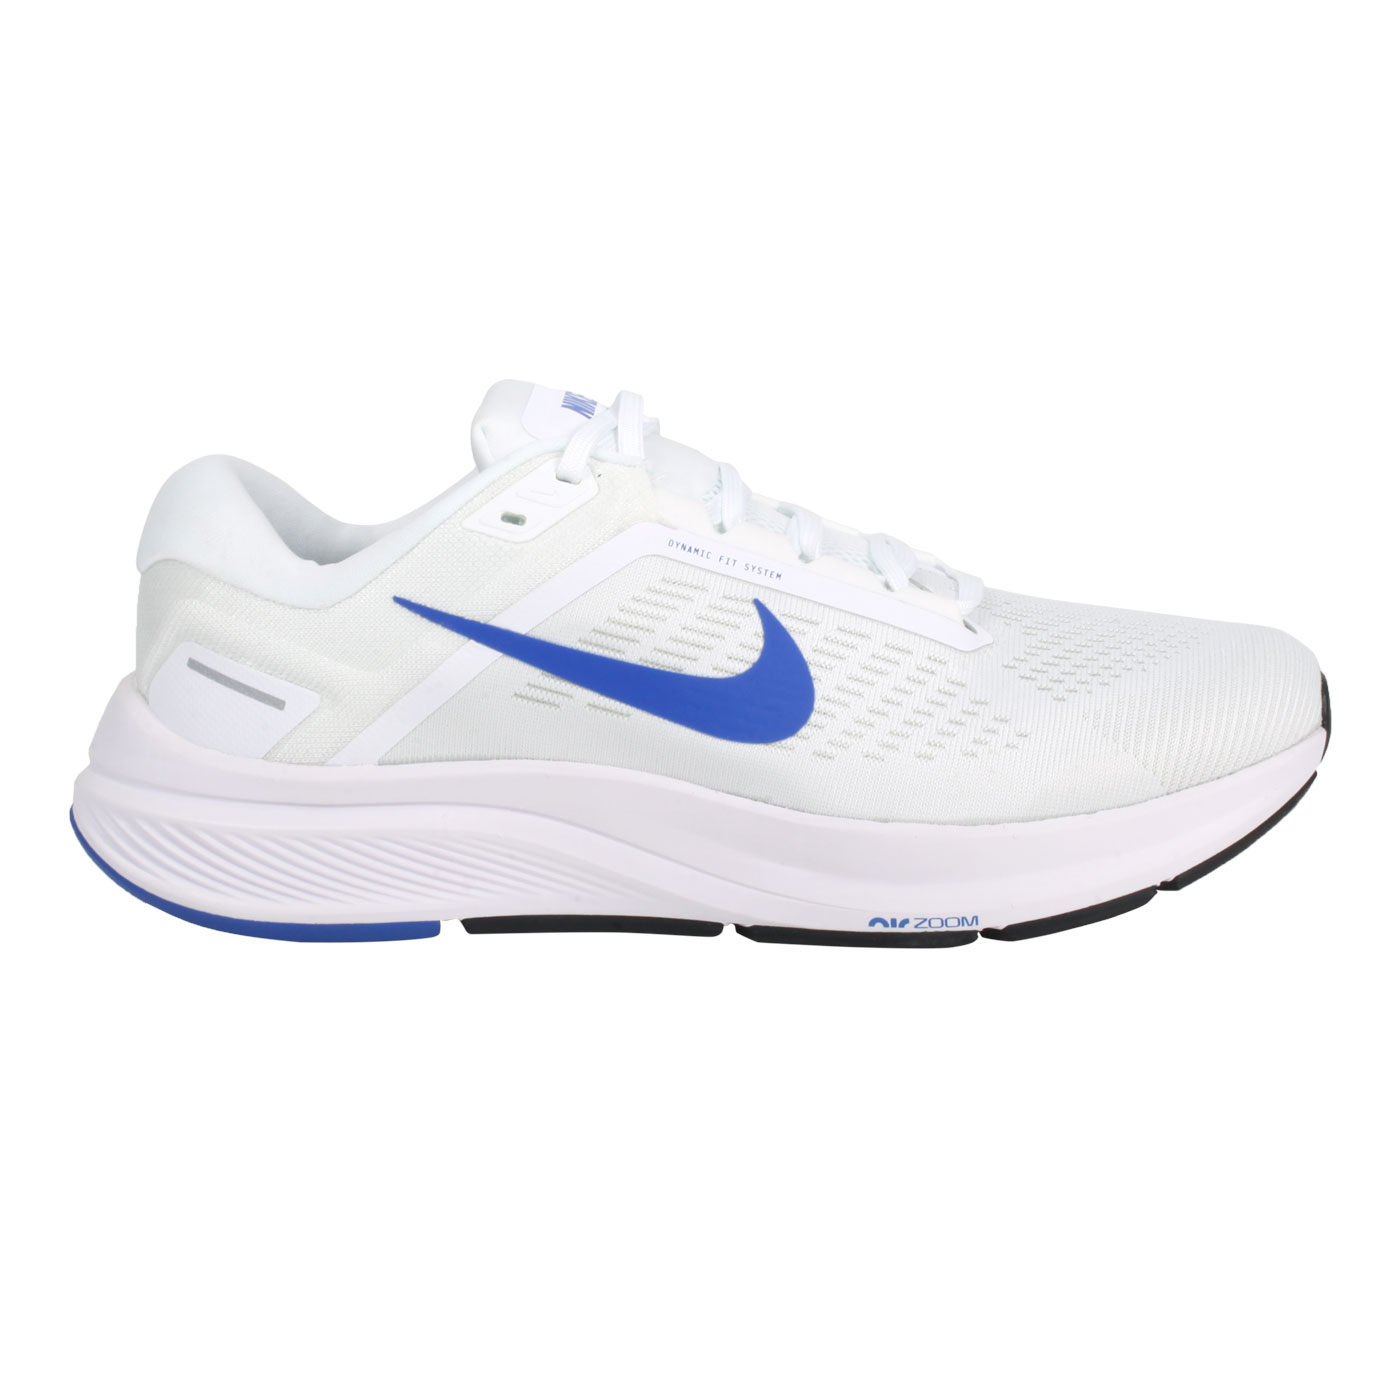 NIKE 男款休閒慢跑鞋  @AIR ZOOM STRUCTURE 24@DA8535-100 - 白藍